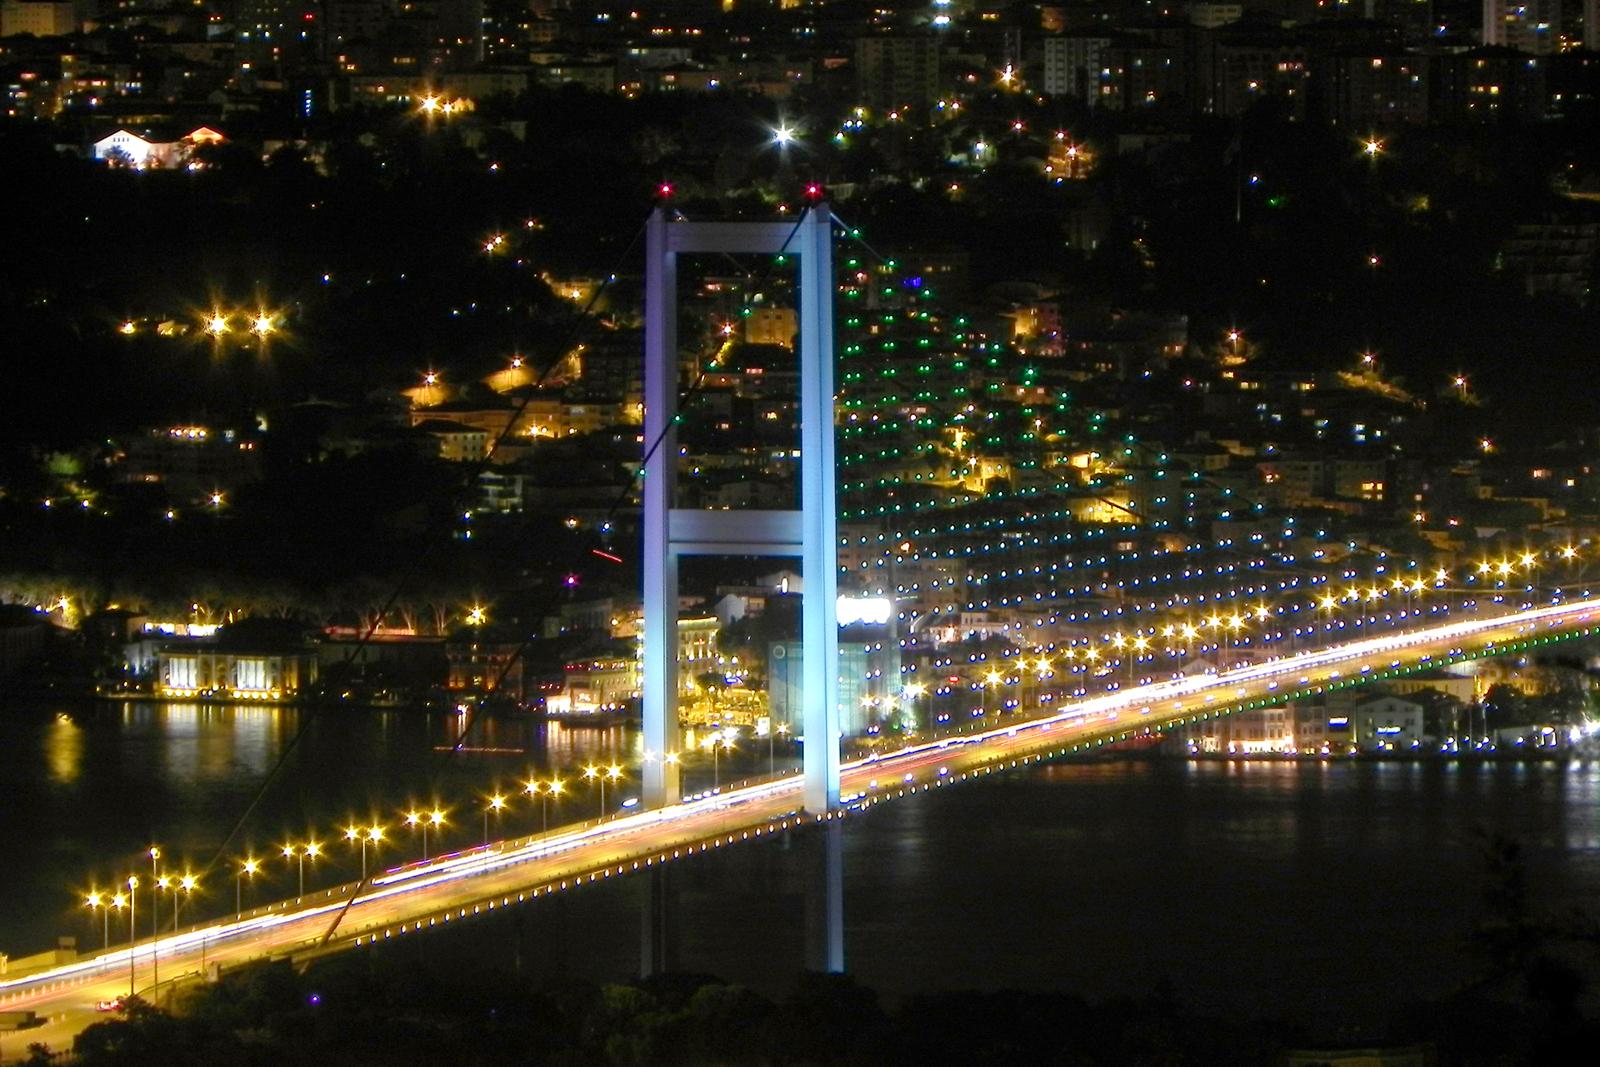 Die blaue Bosporusbrücke